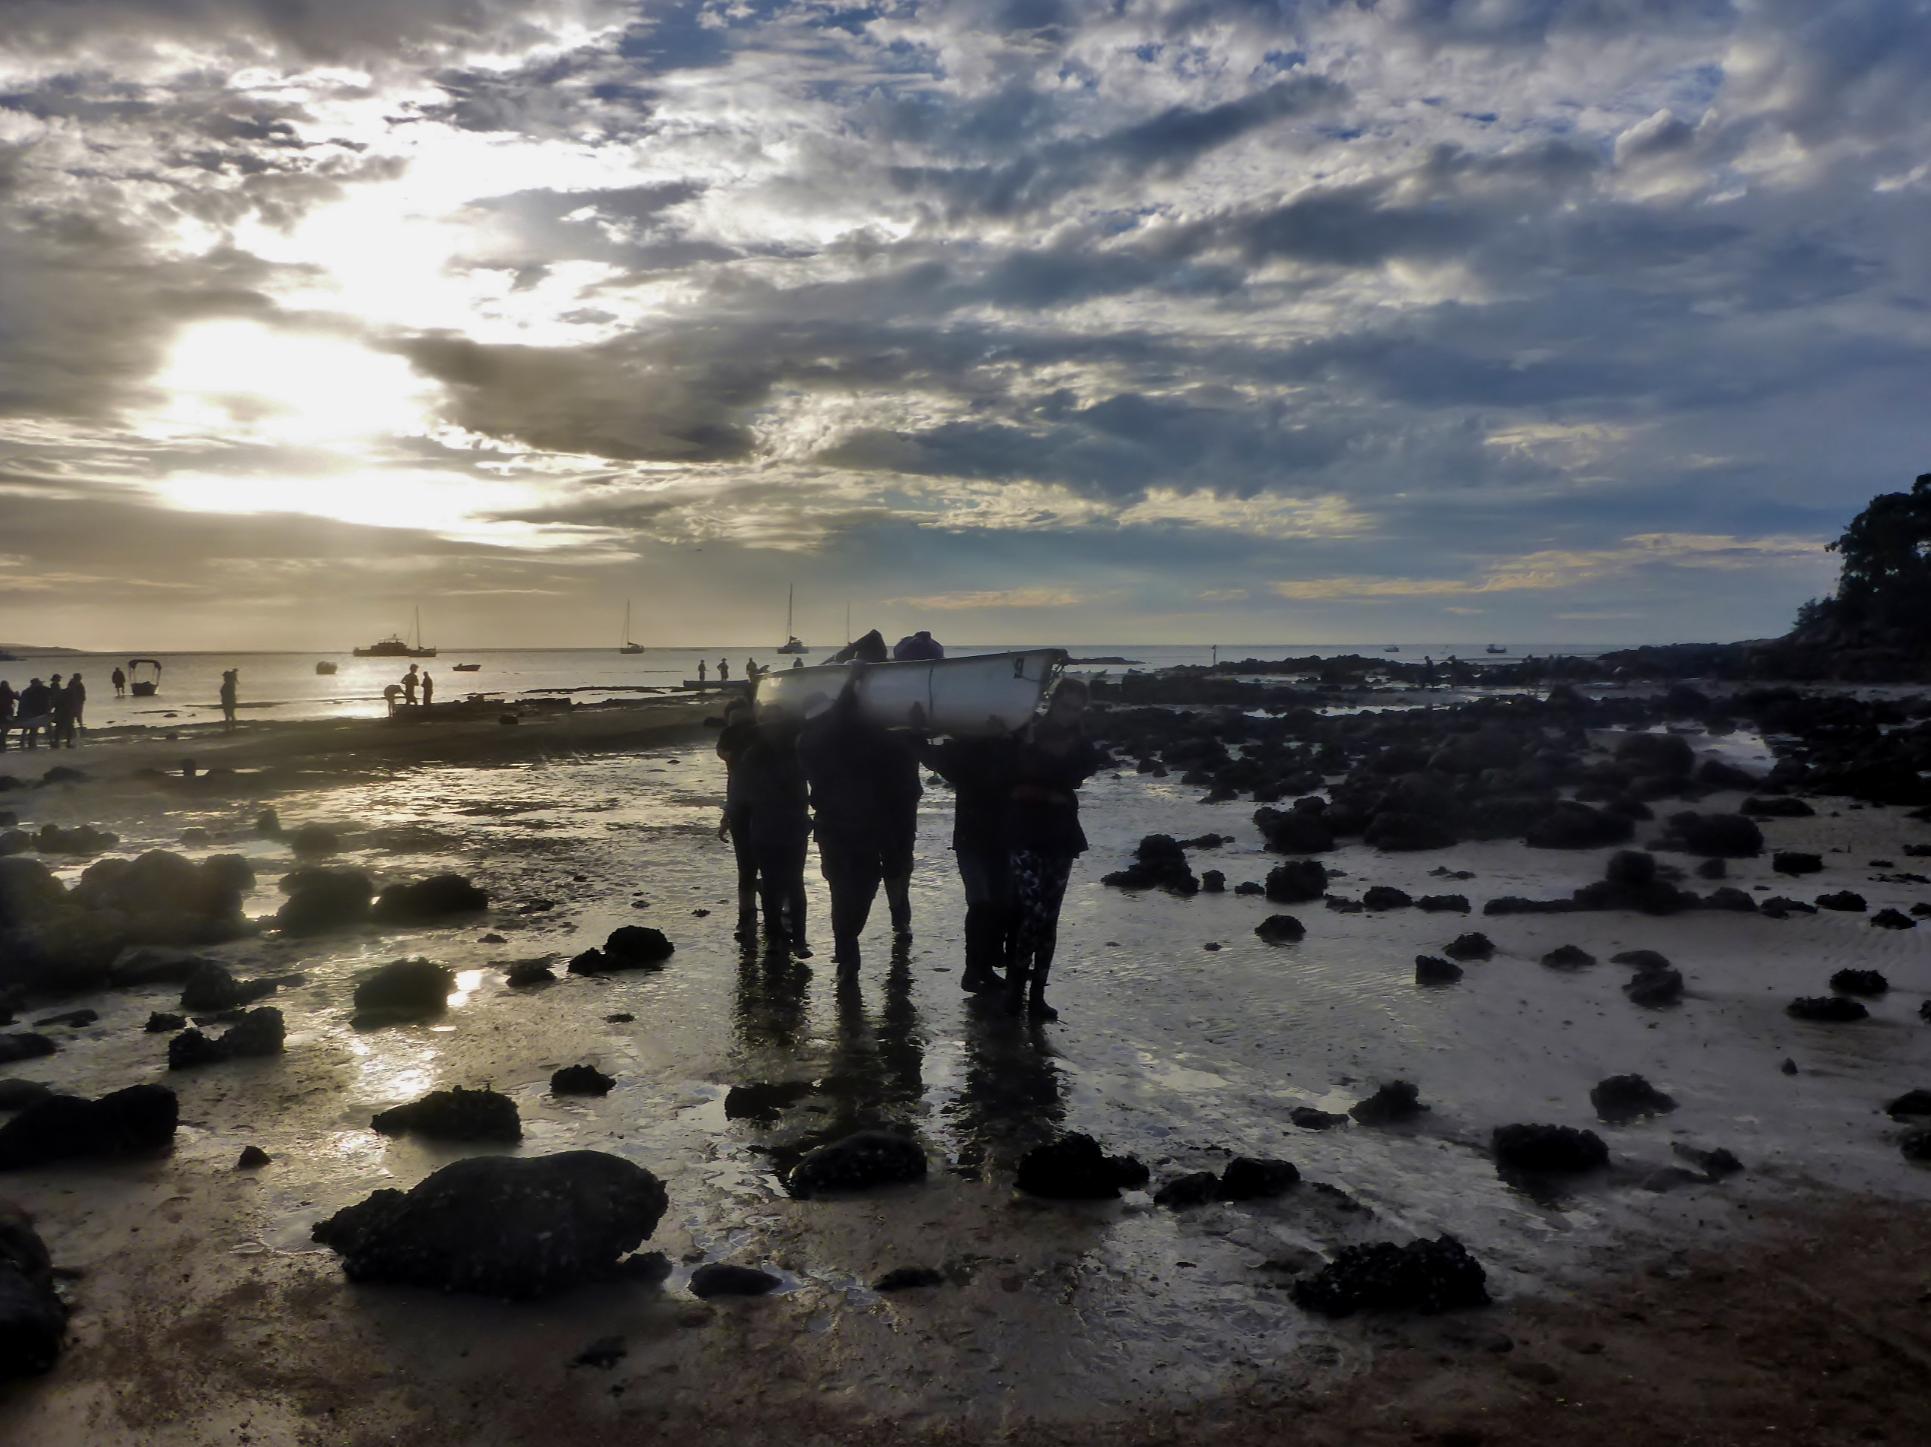 Low Tide Team Beaching by Nadia Ebersohn